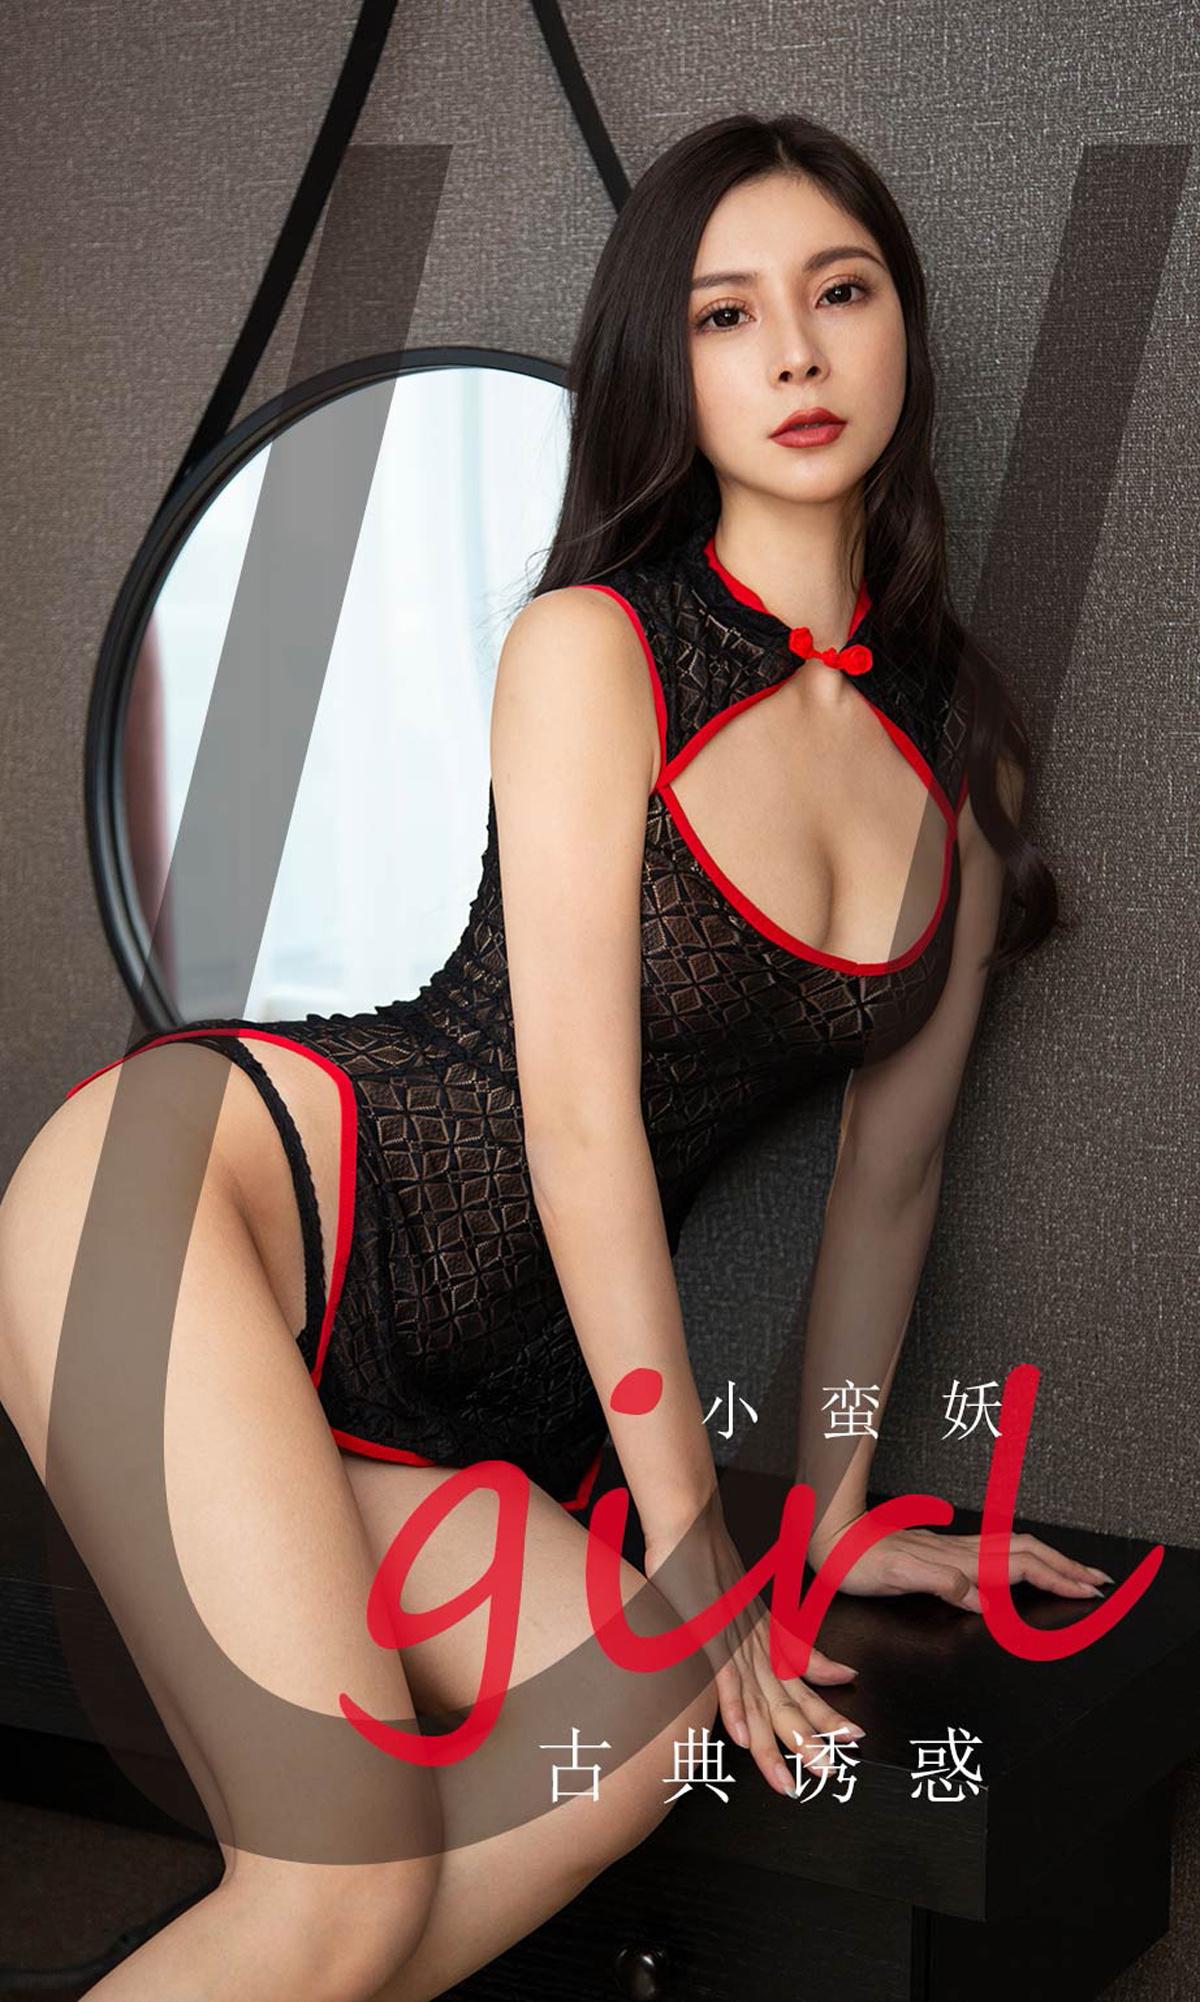 [Ugirls尤果网]爱尤物专辑 2020.03.10 No.1755 古典诱惑 小蛮妖[/25MB]